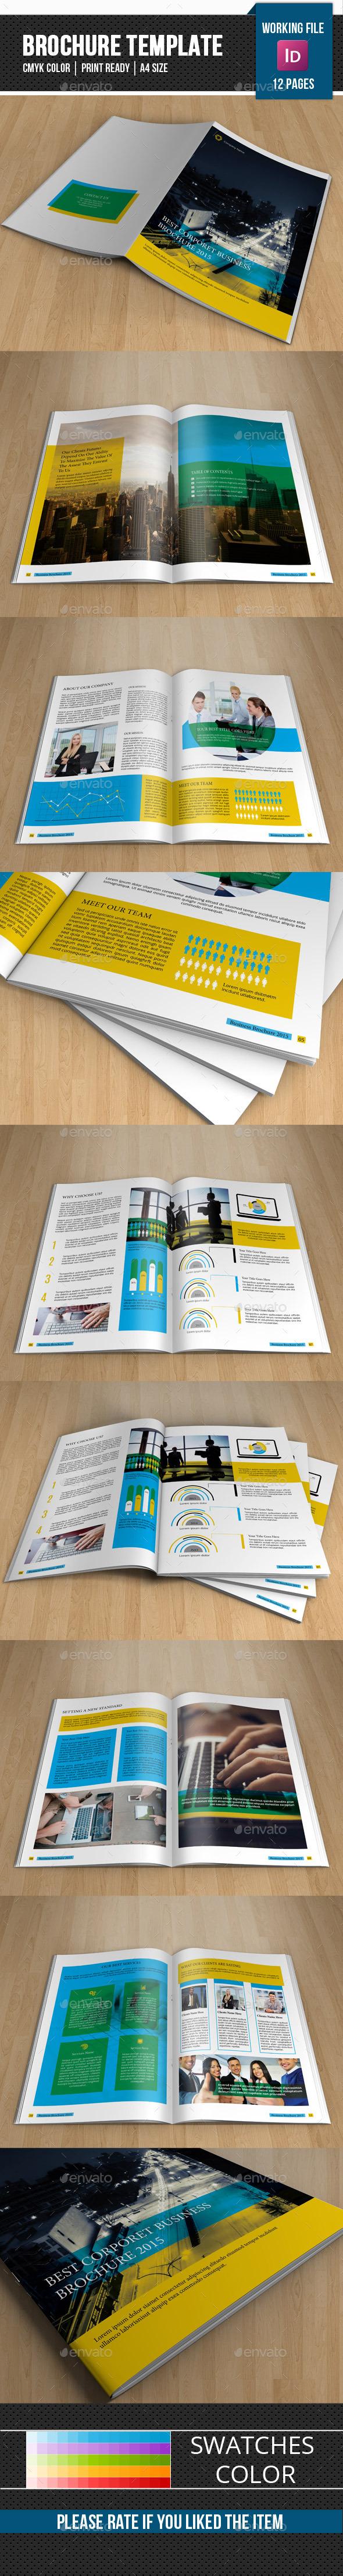 Business Brochure Template-V293 - Corporate Brochures